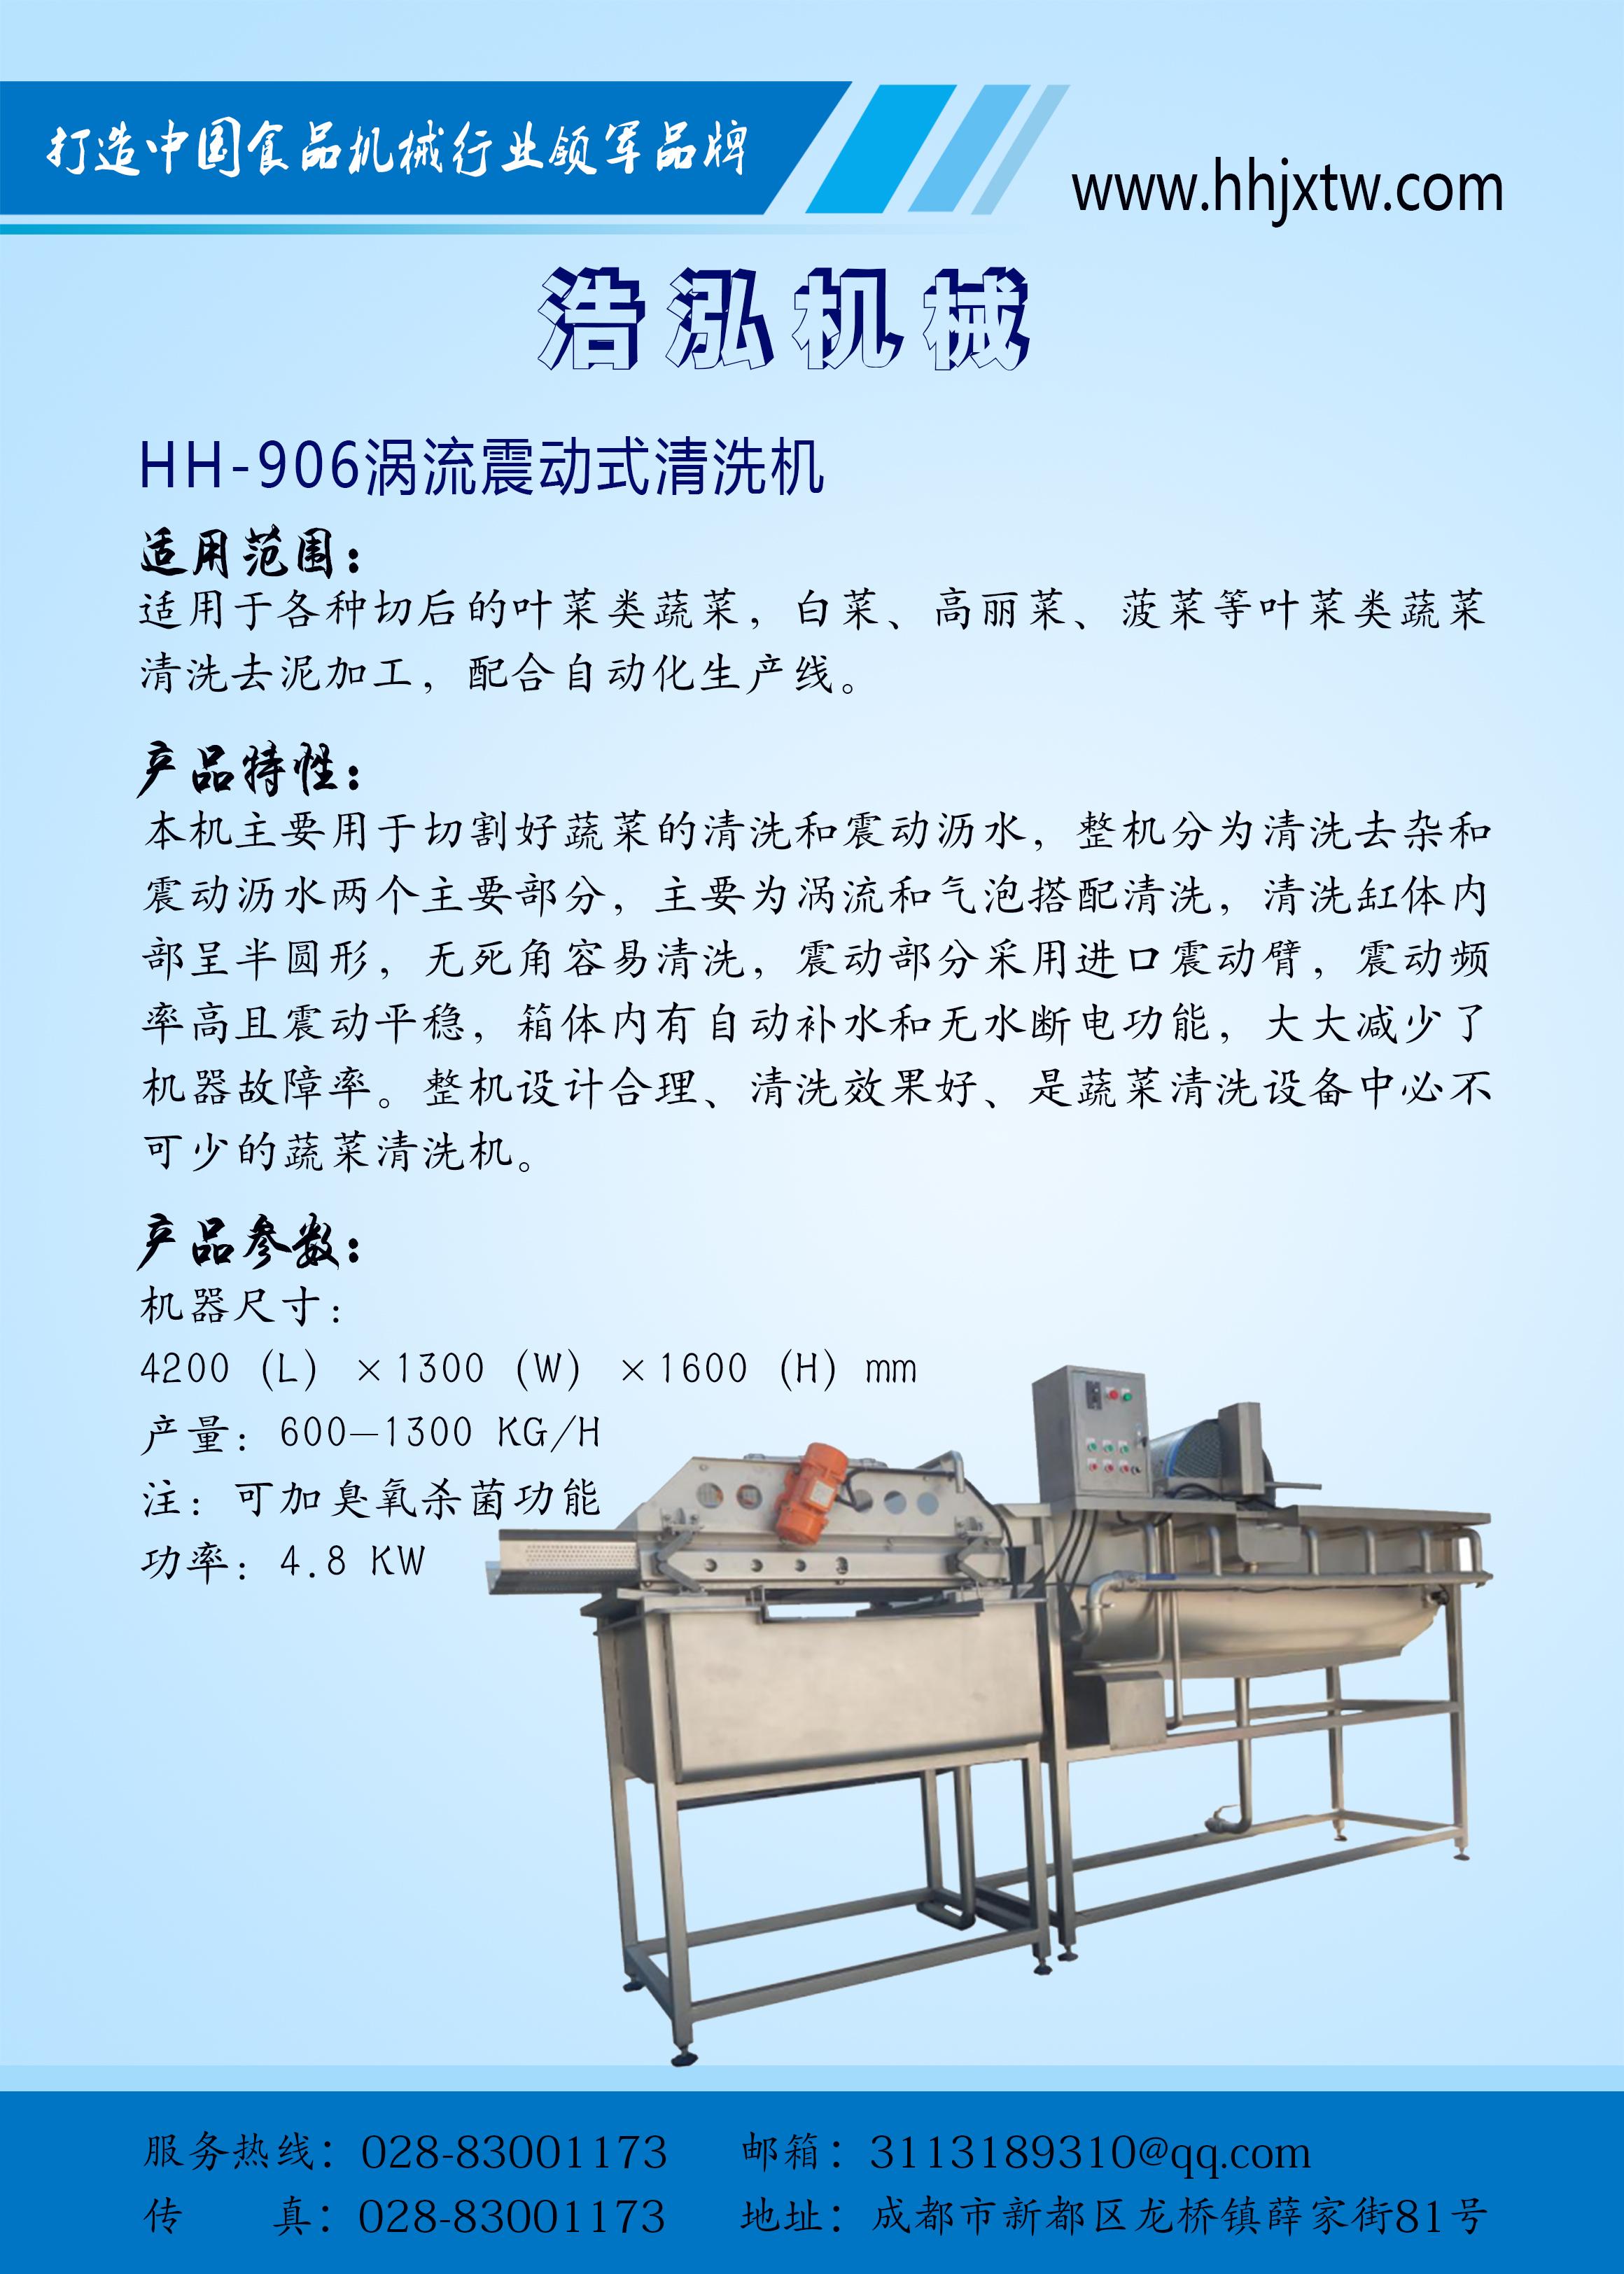 HH-906震动式涡流清洗机